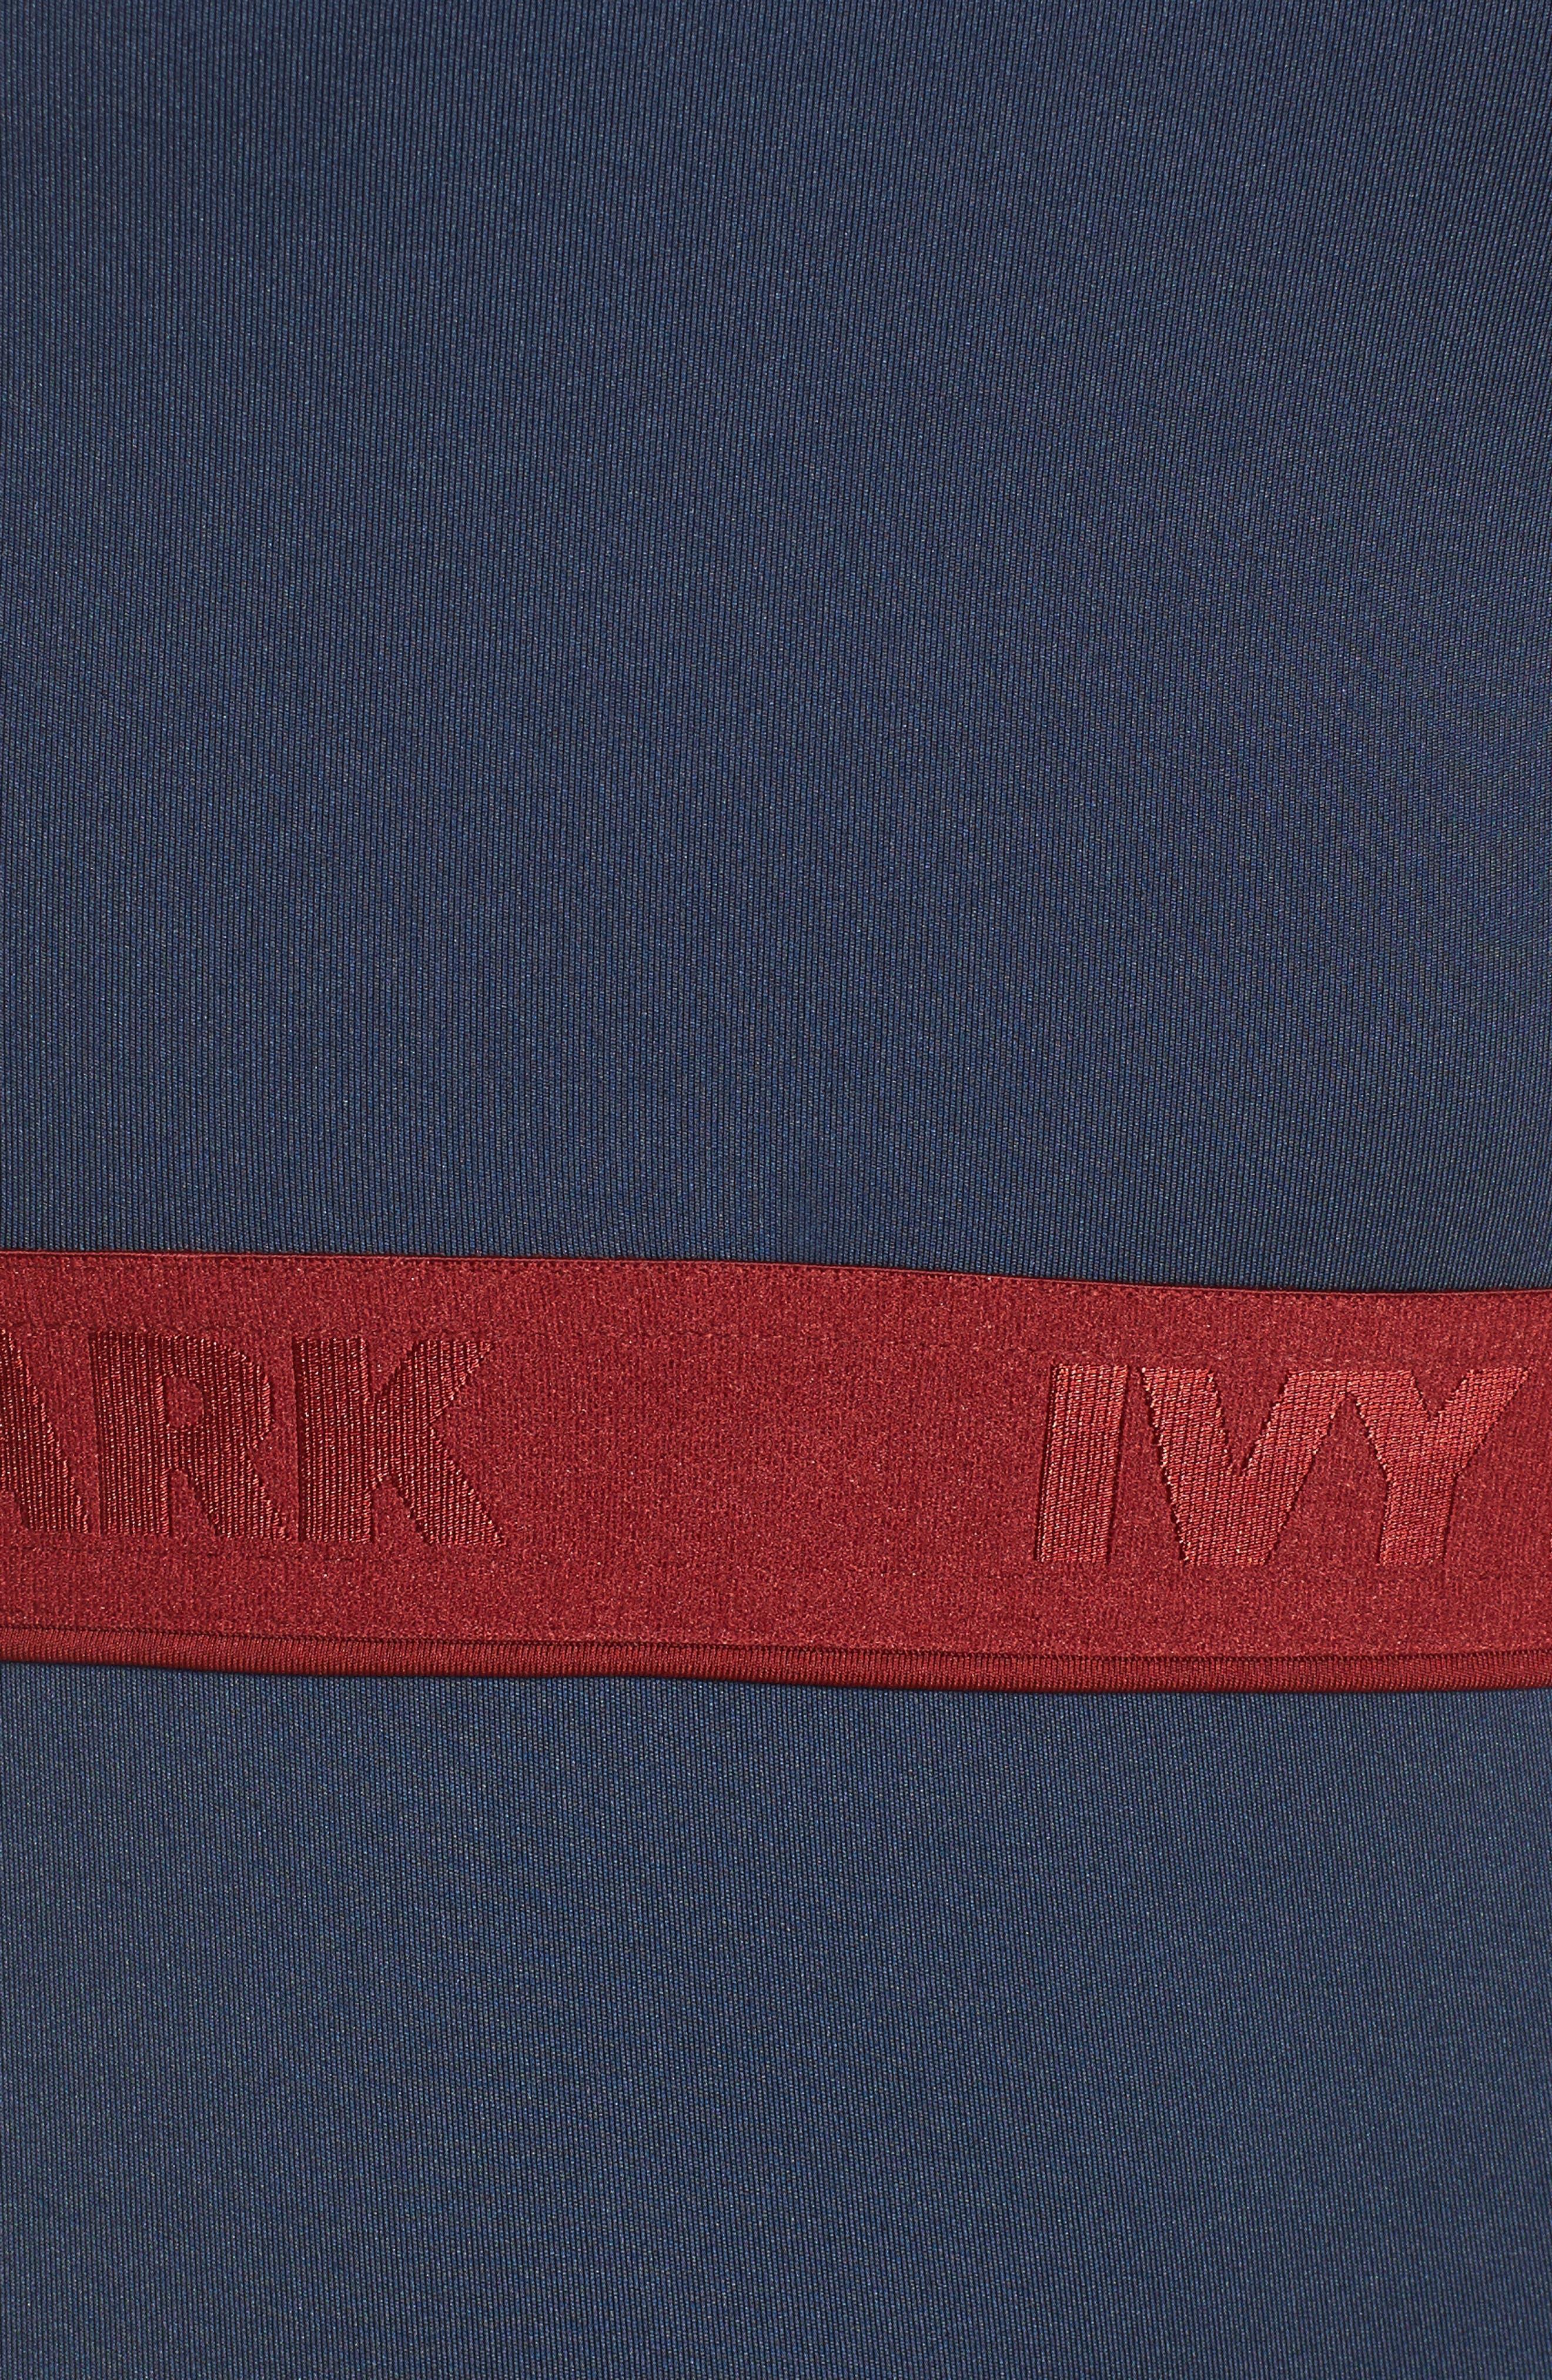 Alternate Image 5  - IVY PARK® Colorblock Mesh Inset Bodysuit